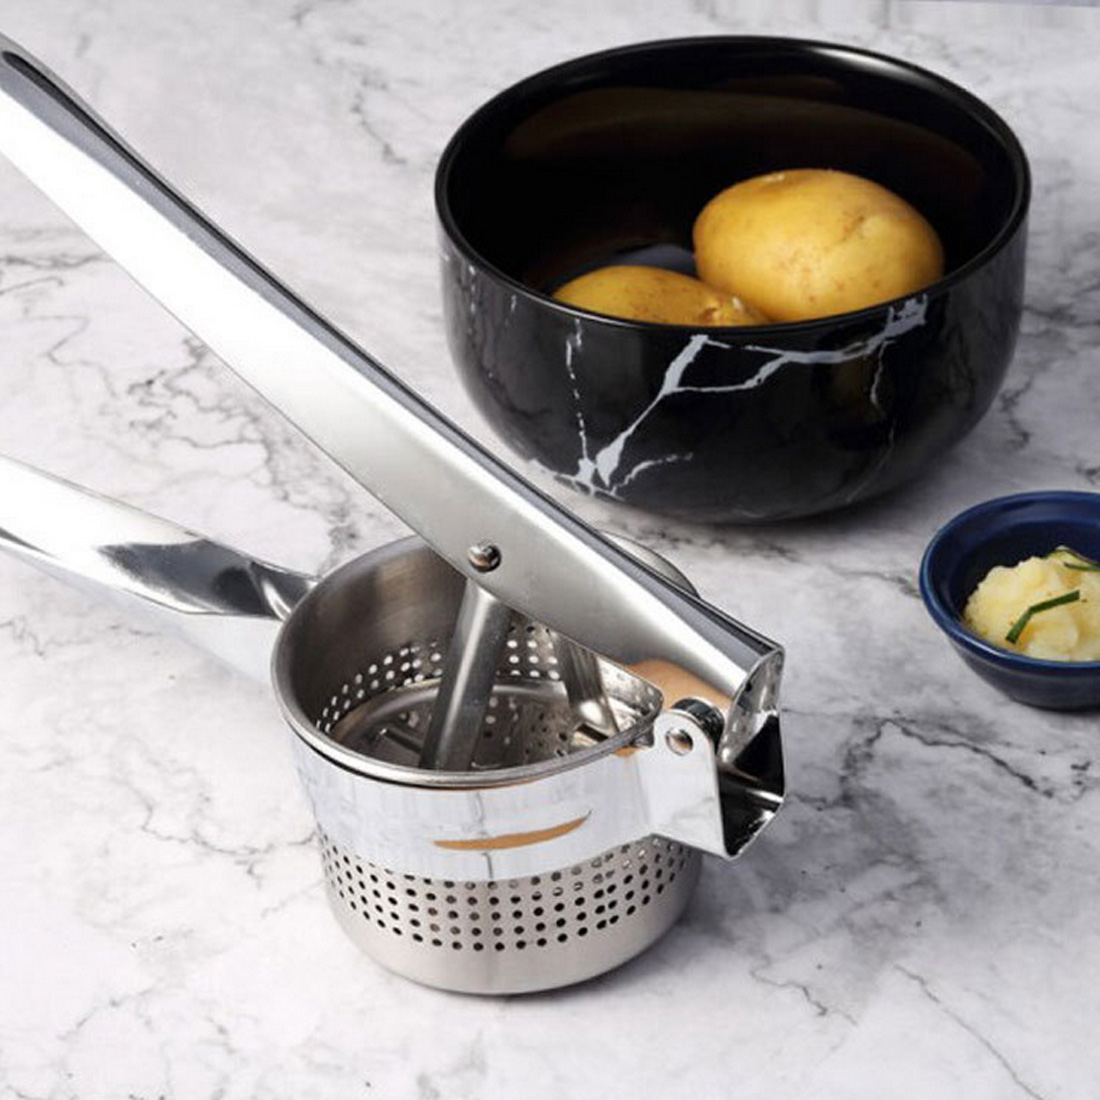 Kitchen Gadgets Stores: Aliexpress.com : Buy Potato Mashers Convenient Kitchen